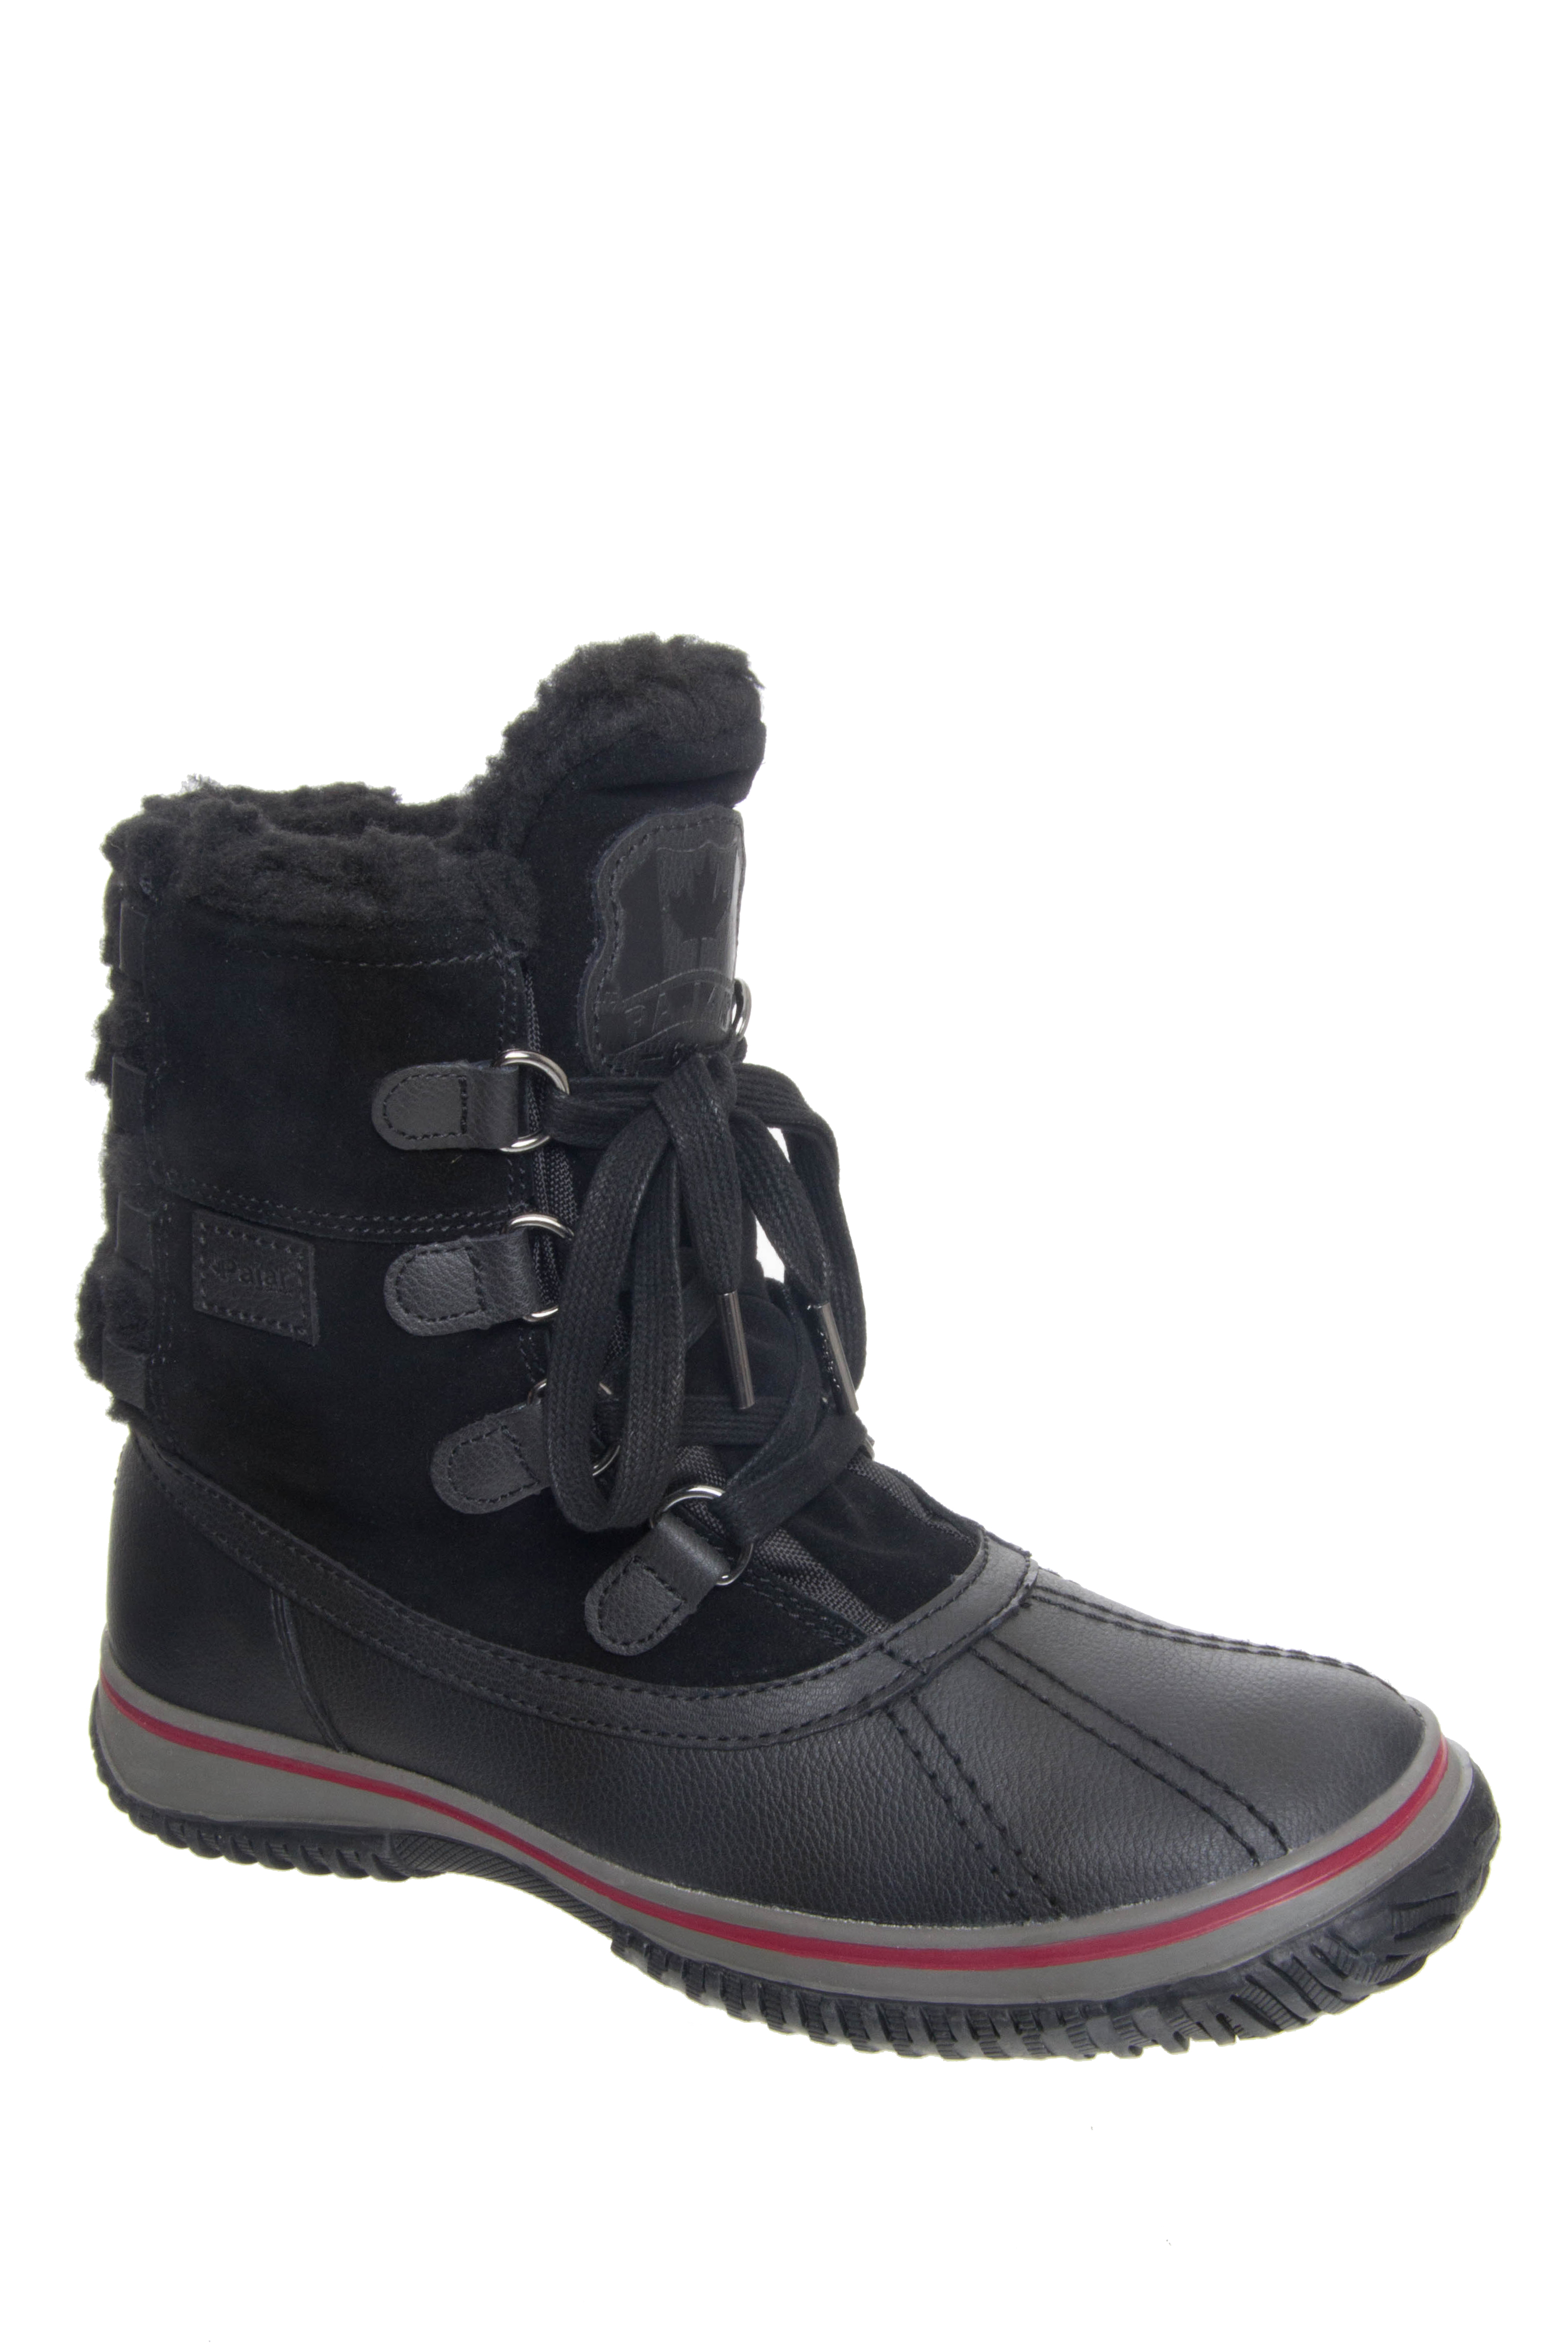 Pajar Iceland Snow Boots - Black